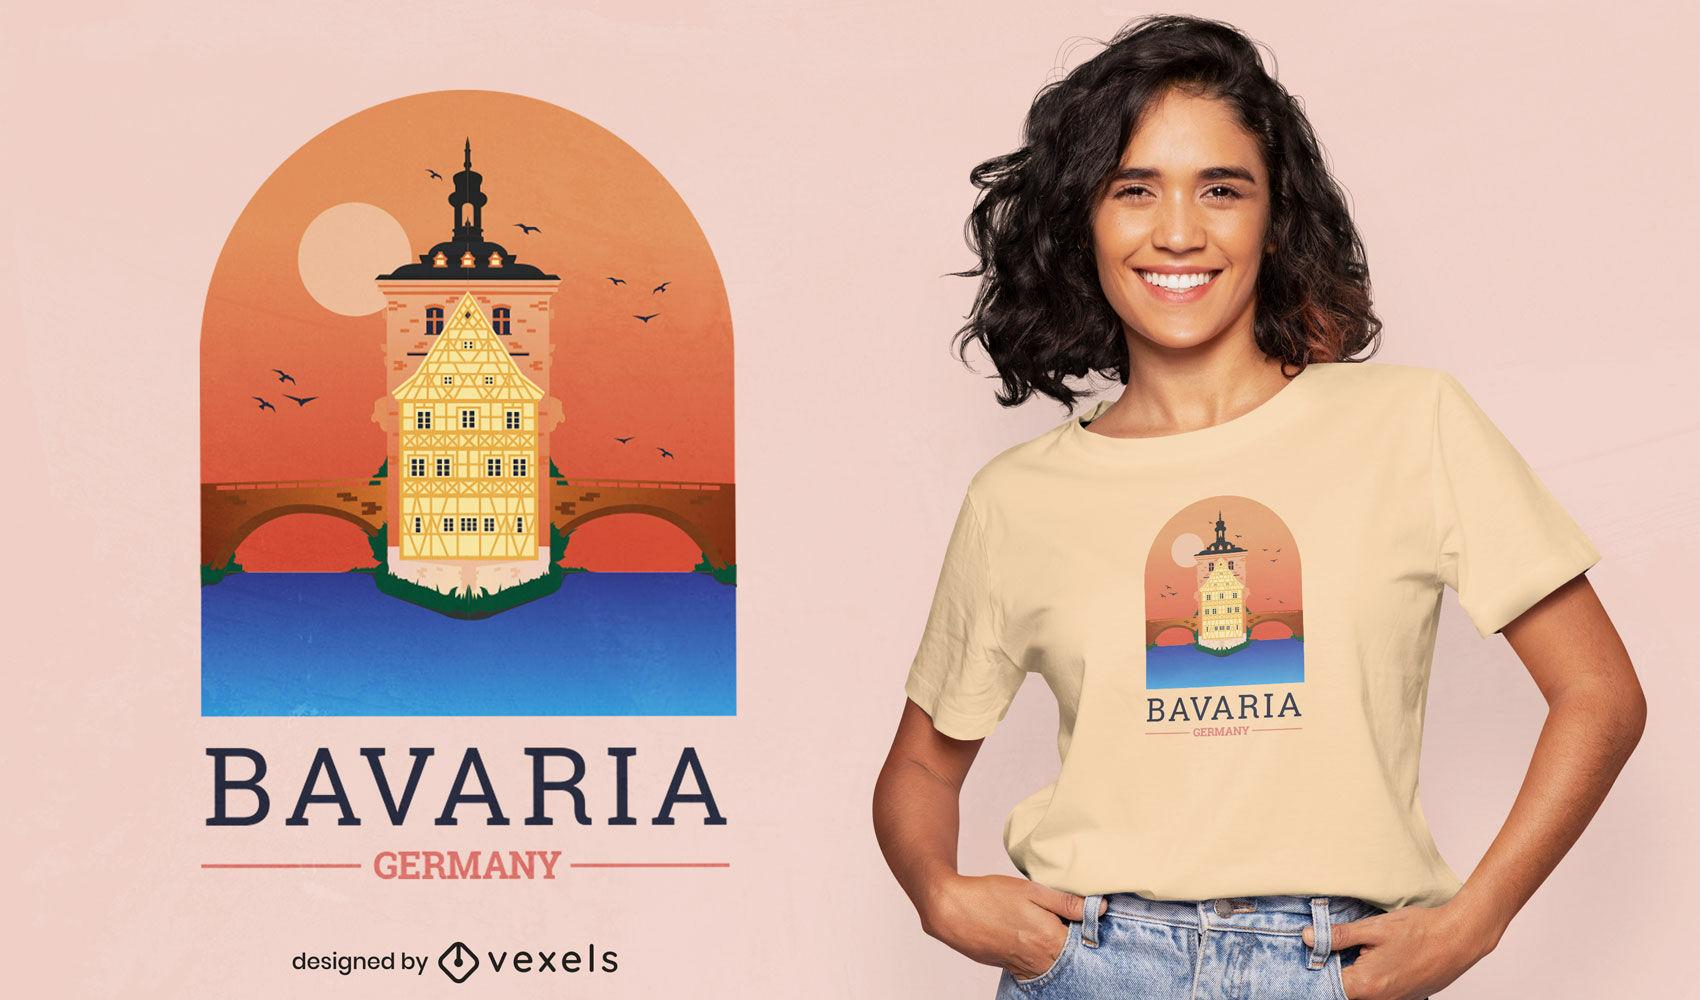 Bavaria Germany city landscape t-shirt design